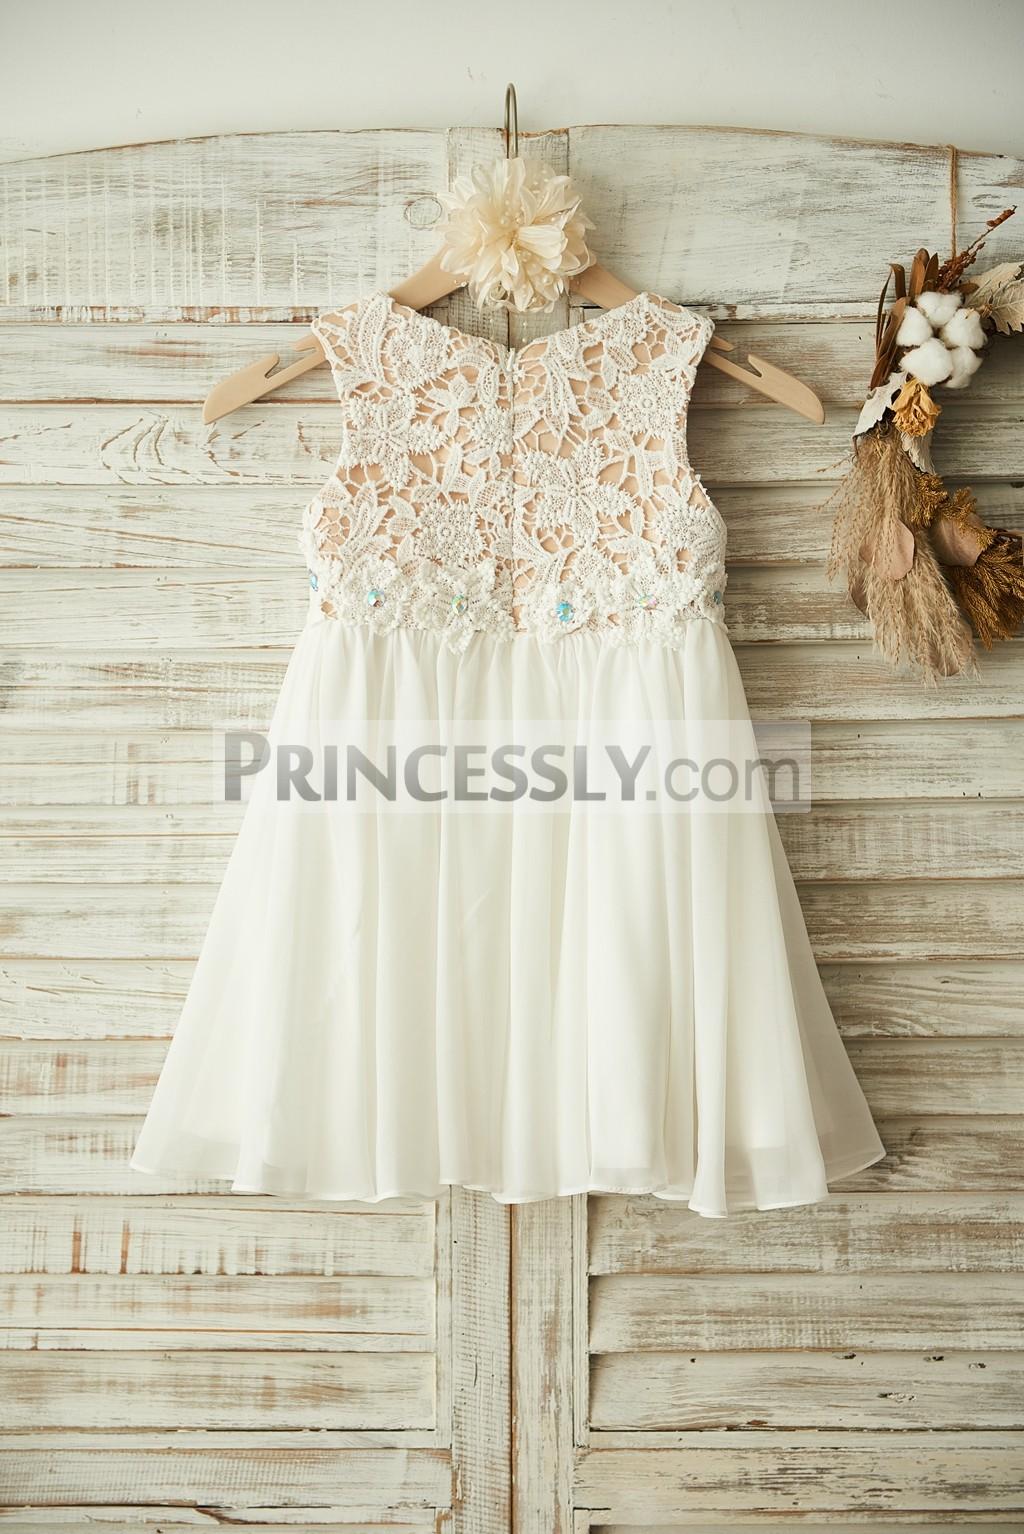 Champagne Satin Lining Lace Cover Chiffon Wedding Baby Girl Dress